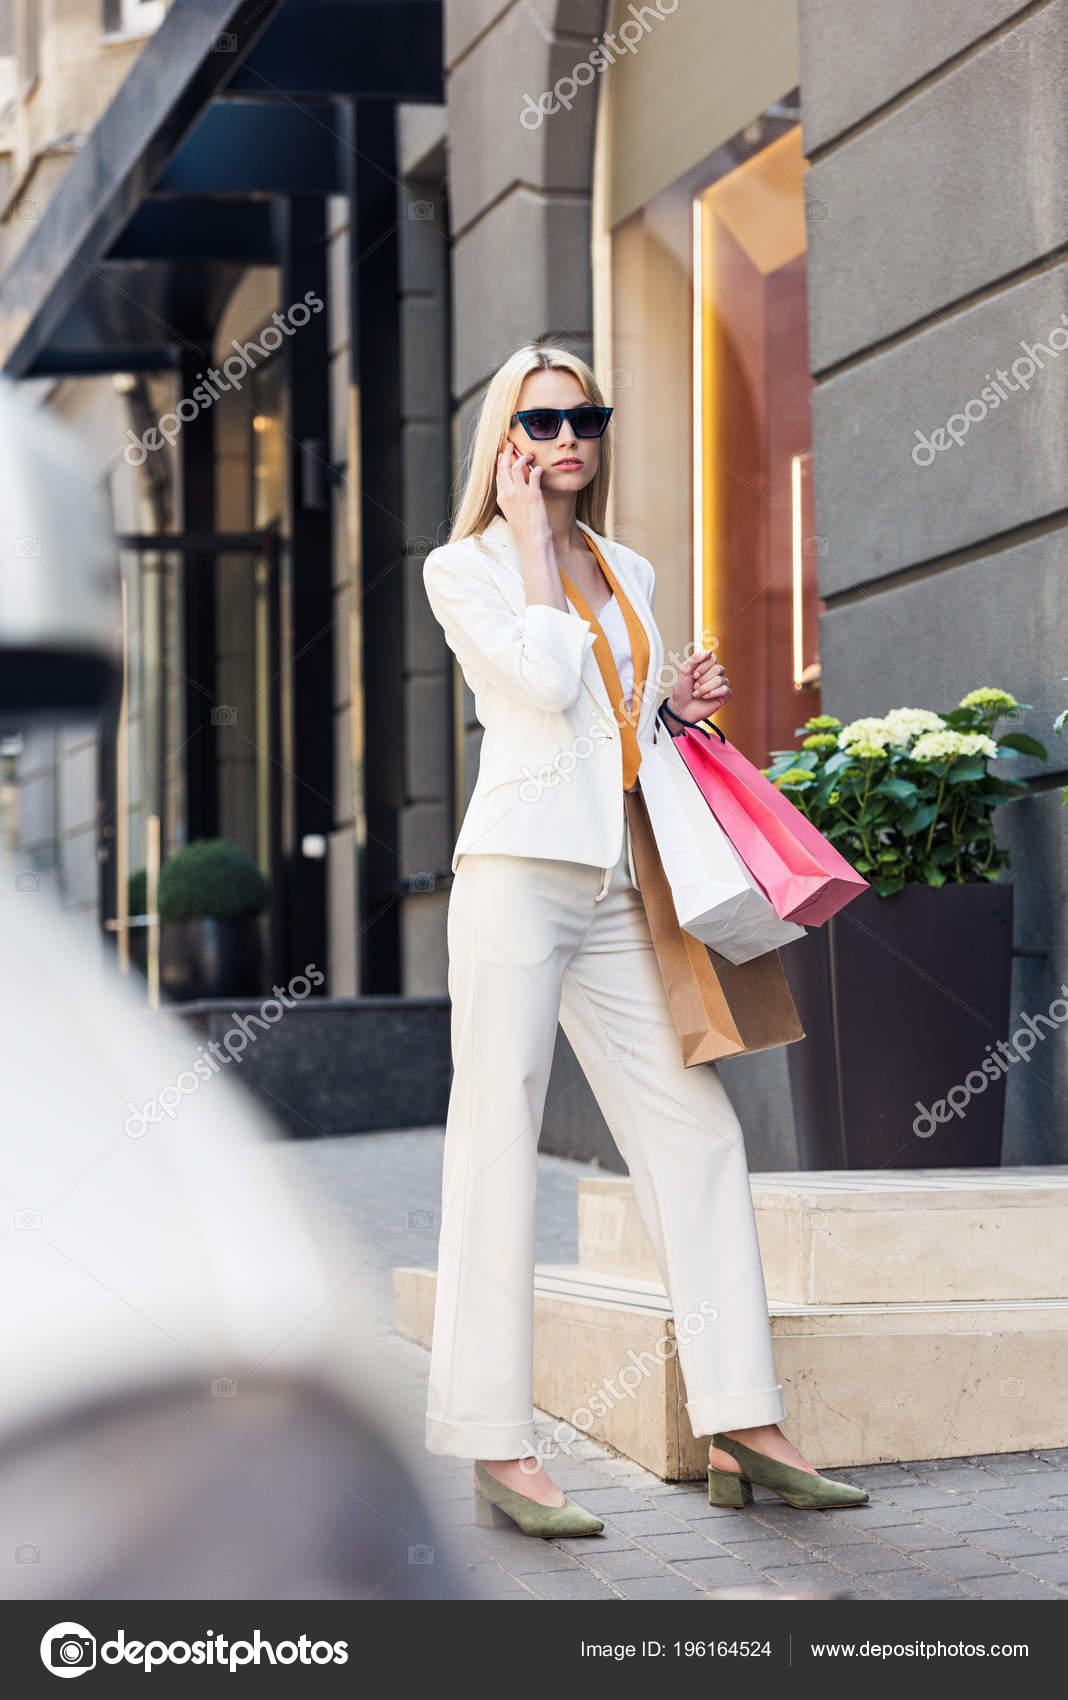 25d9c7cd0e Επιλεκτική εστίαση της μόδας νεαρή γυναίκα σε γυαλιά ηλίου κρατώντας  χάρτινες τσάντες και να μιλάμε από το smartphone στην οδό — Εικόνα από ...